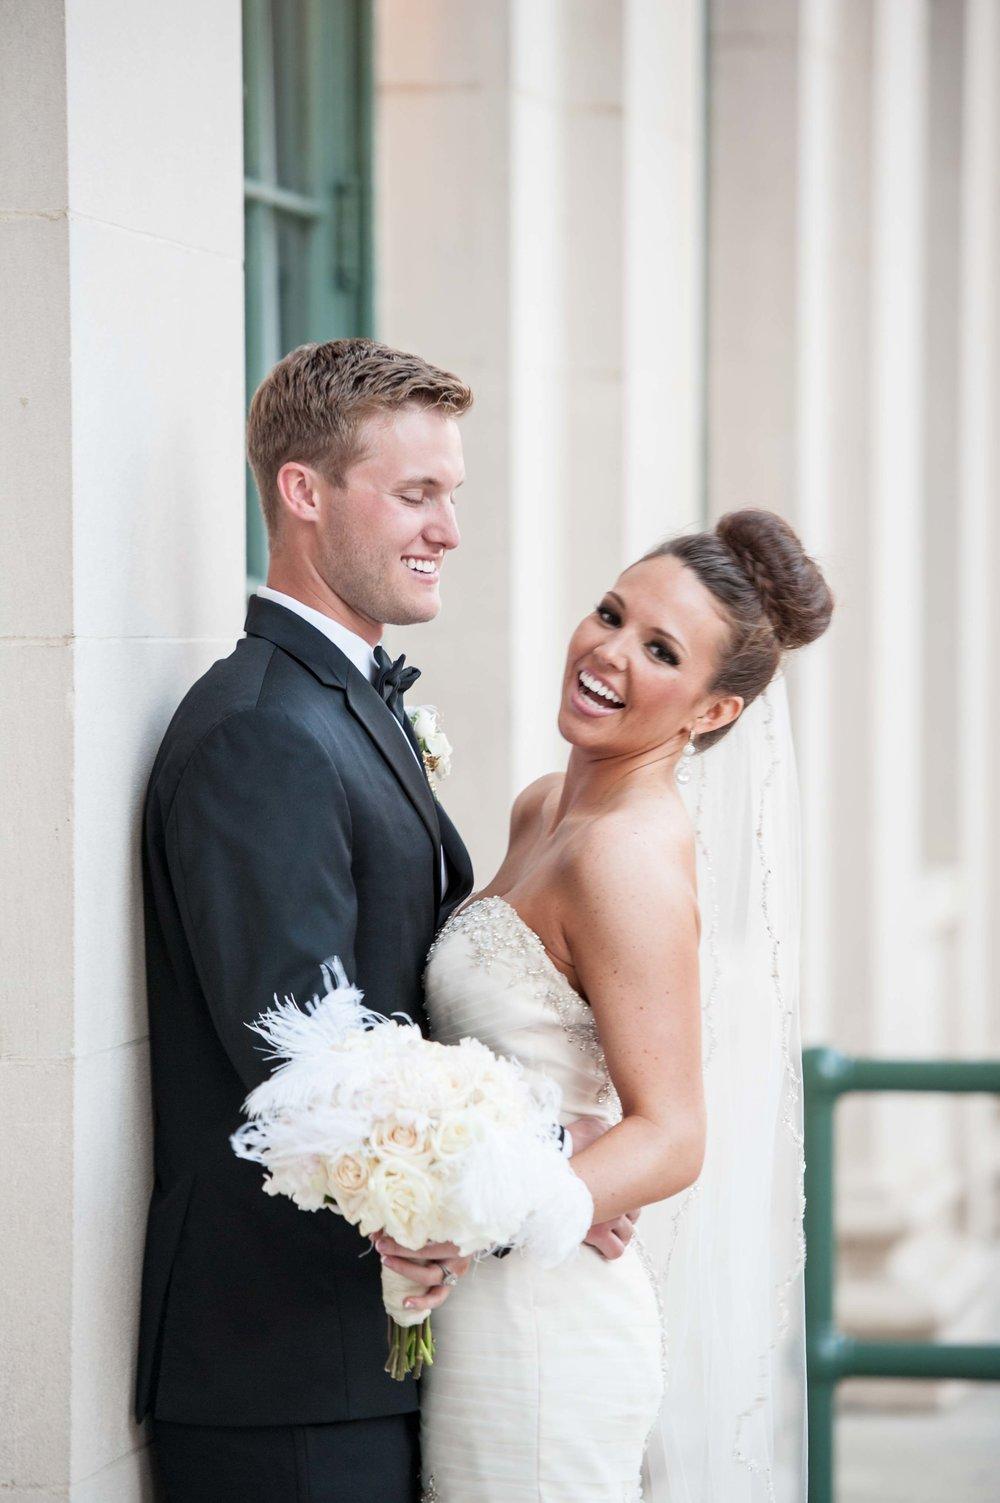 Hughes Williams - Triad Weddings - Yasmin Leonard Photography-18.jpg